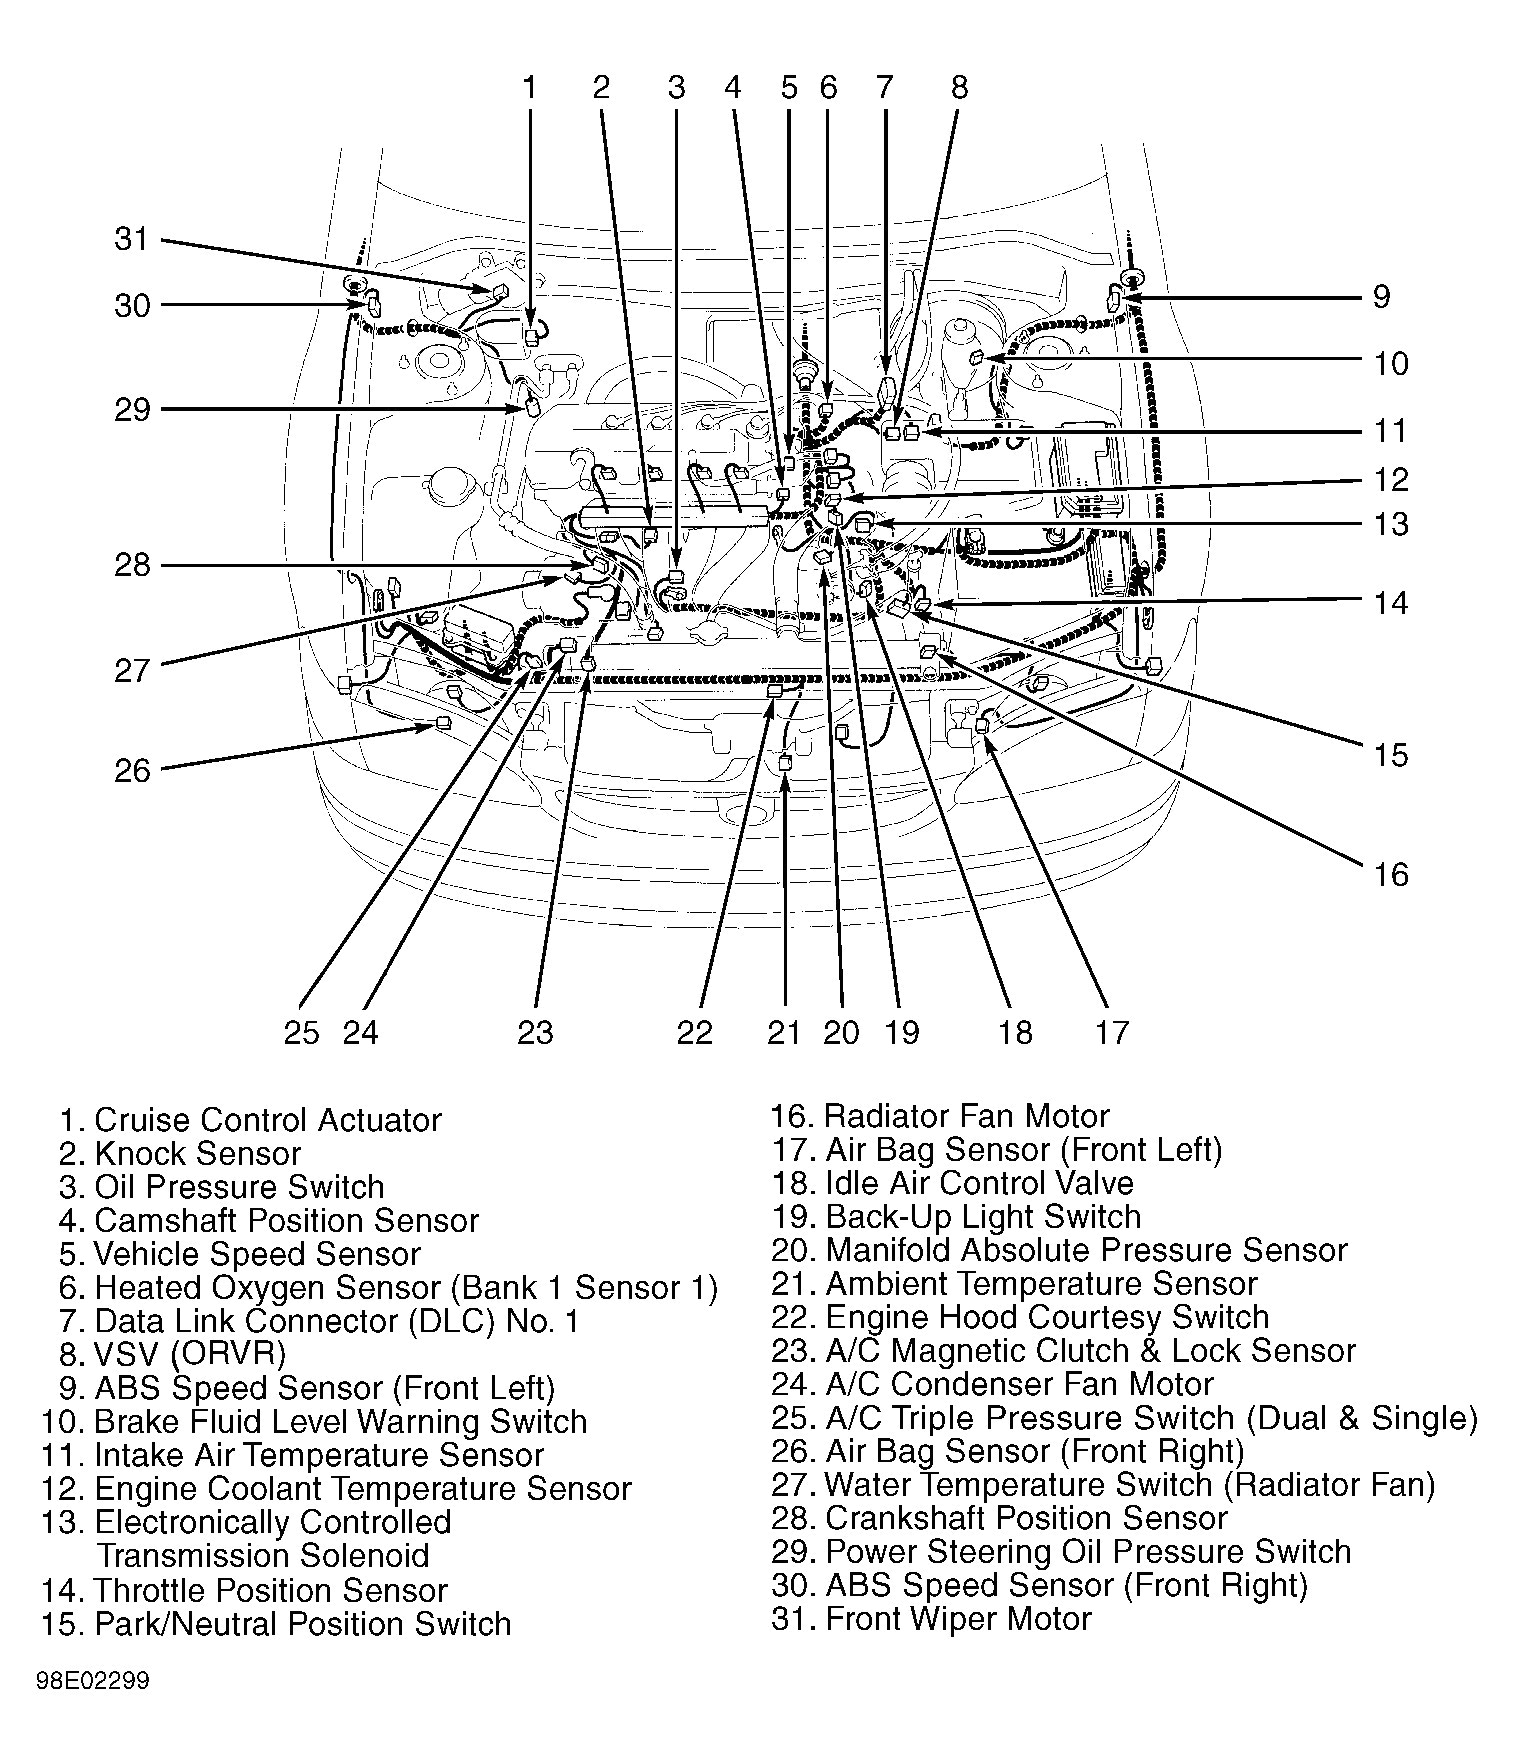 camshaft sensor wiring diagram fresh corolla wiring diagram valid 1999 toyota corolla parts diagram new